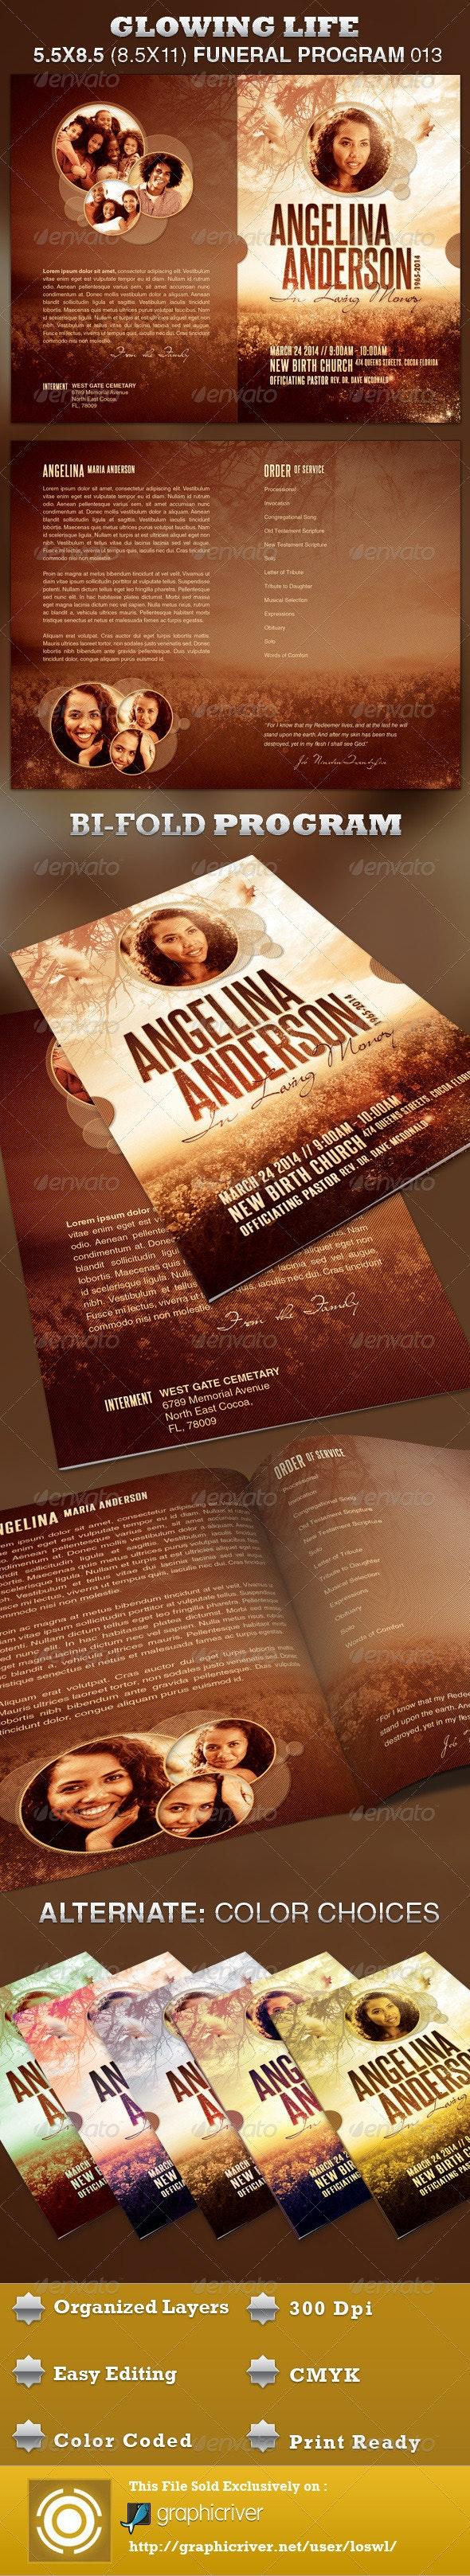 Glowing Life Funeral Program Template 013 - Informational Brochures